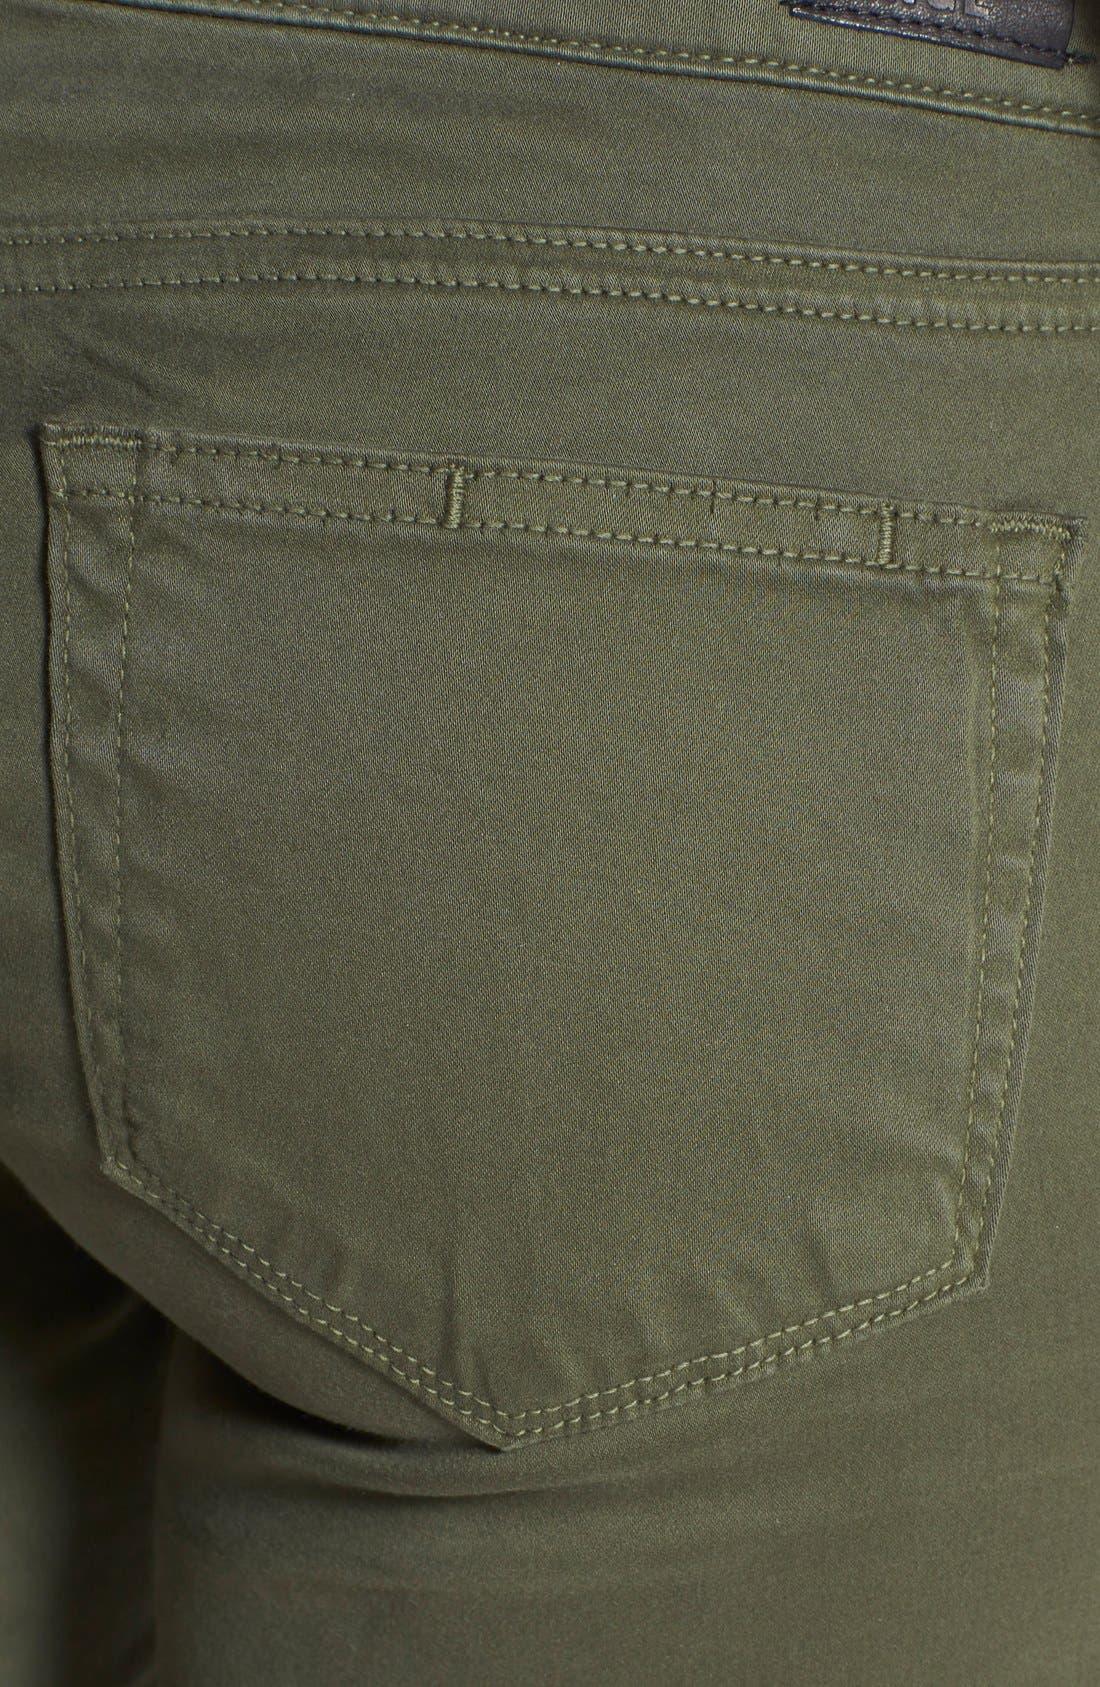 Alternate Image 3  - Paige Denim 'Edgemont' Ultra Skinny Jeans (Pine Green)